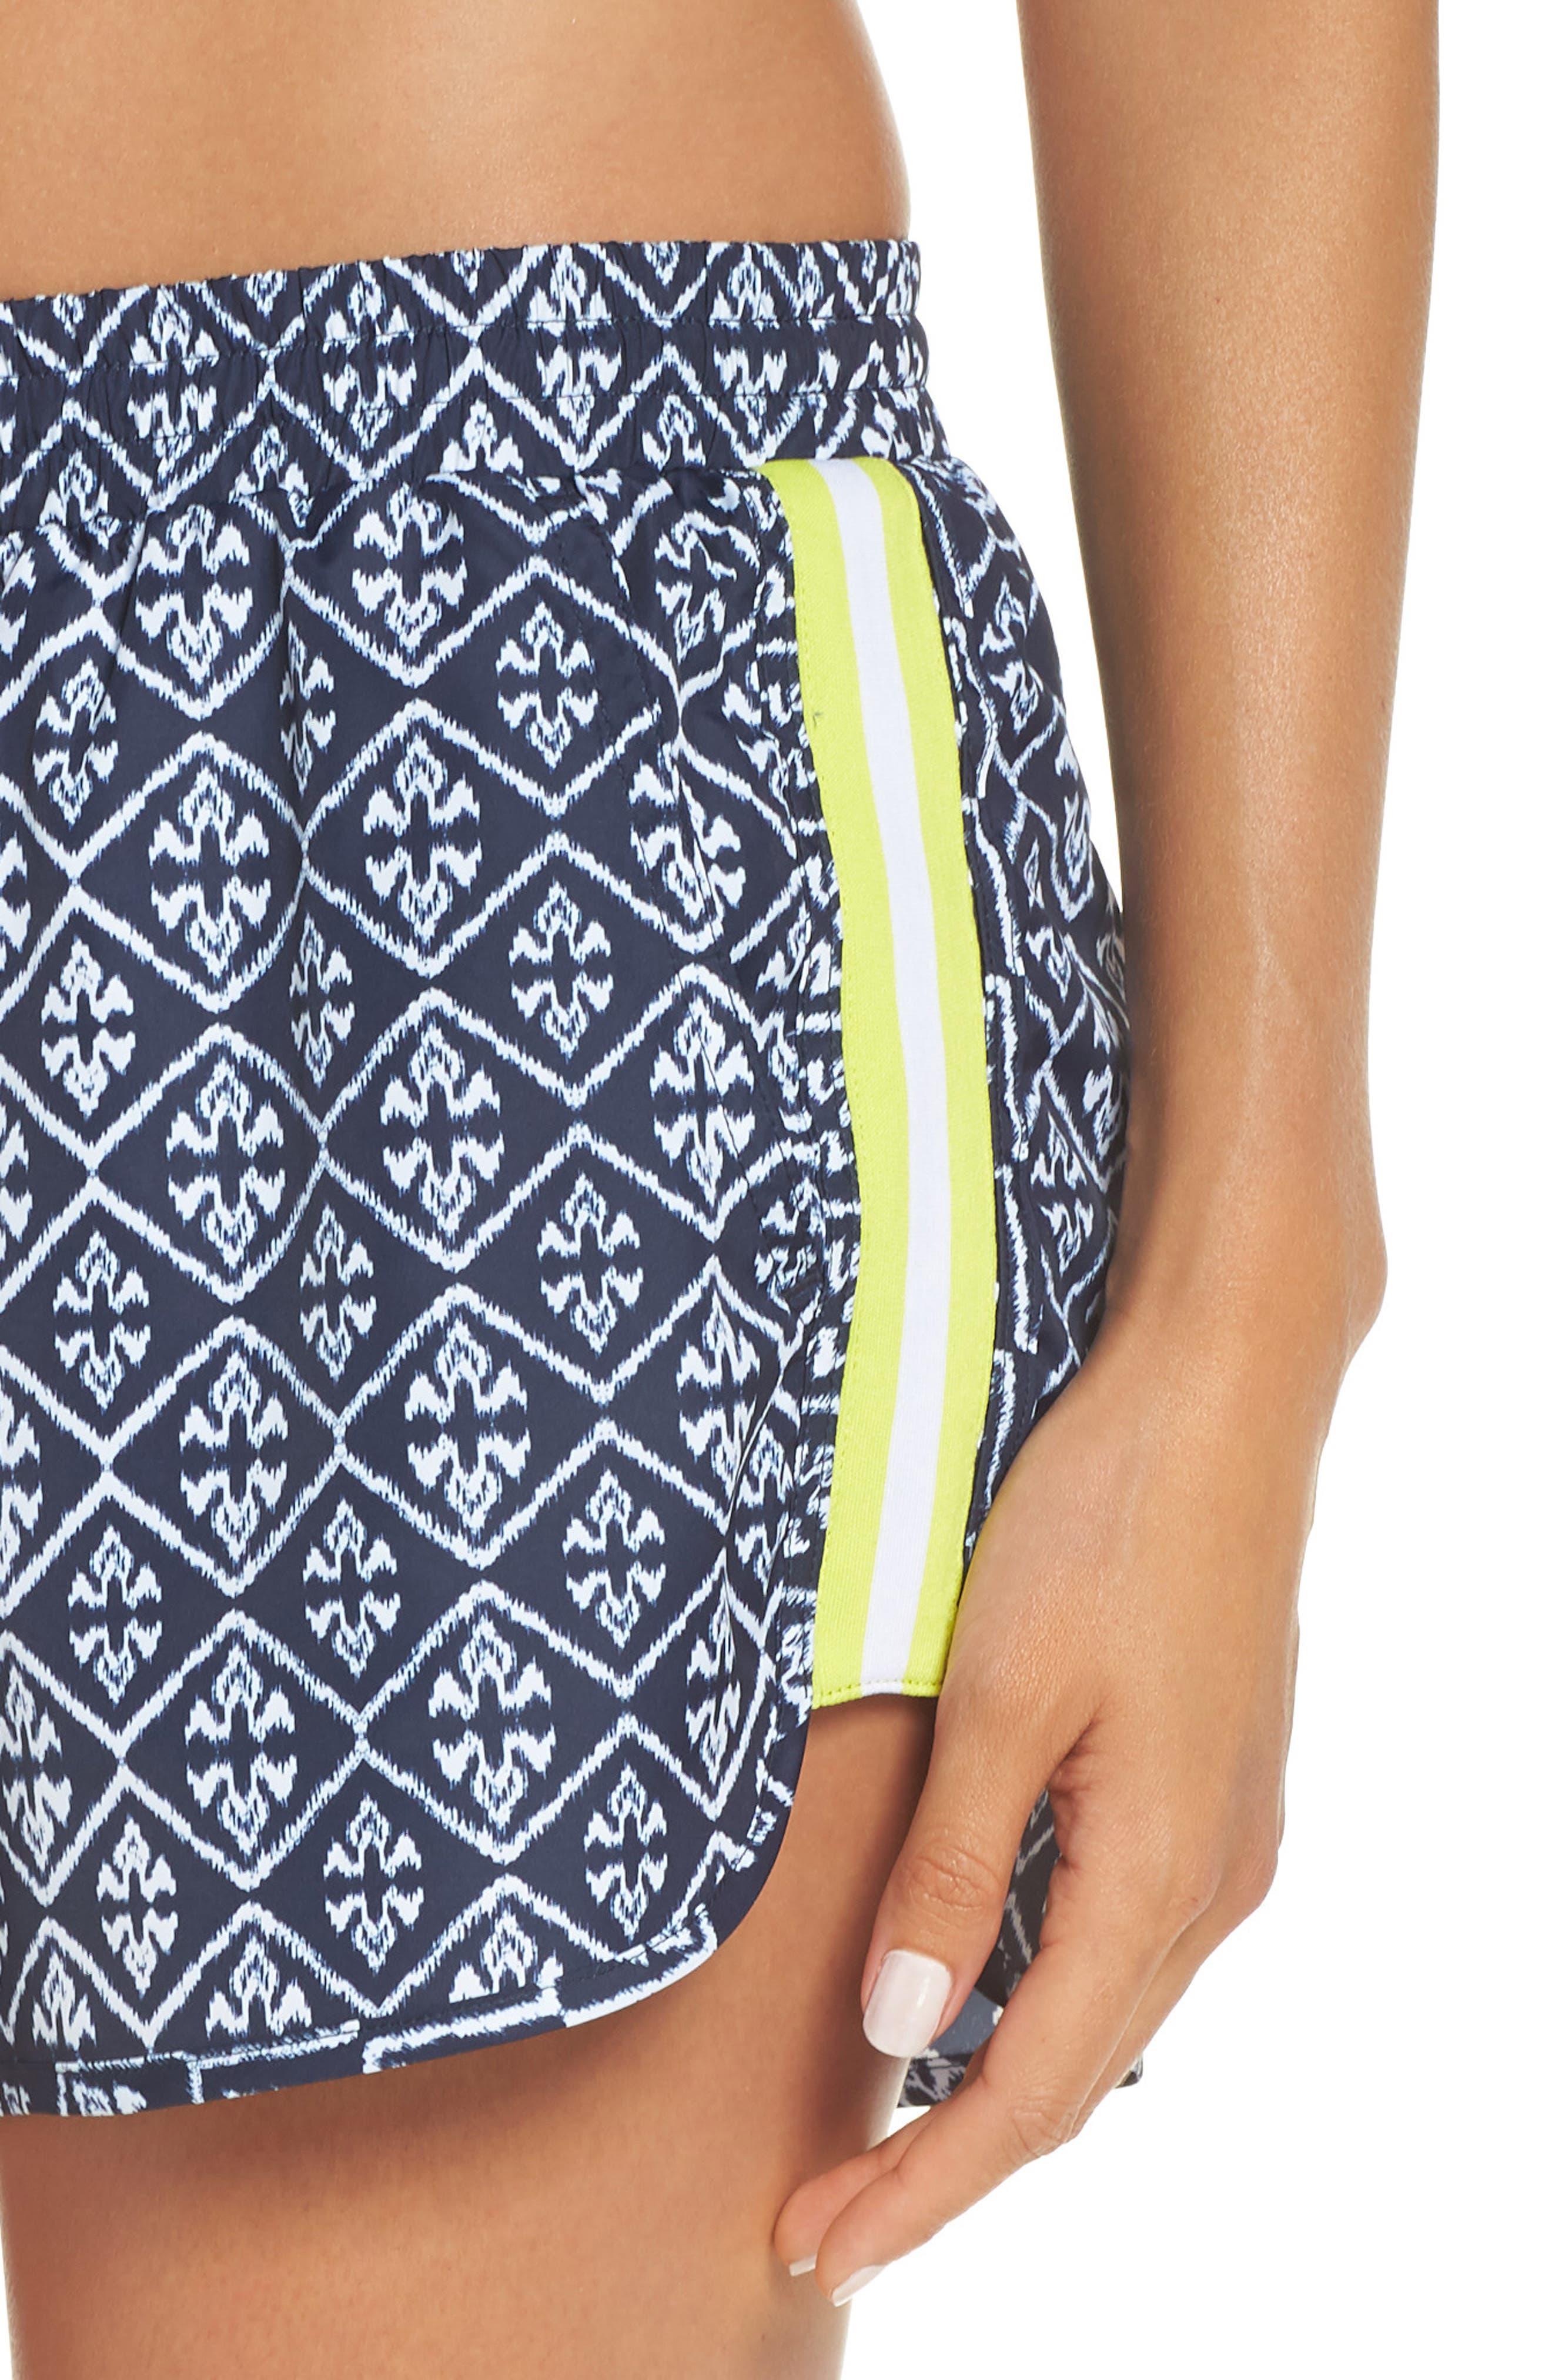 Ikat Neon Running Shorts,                             Alternate thumbnail 4, color,                             INDIGO/ WHITE